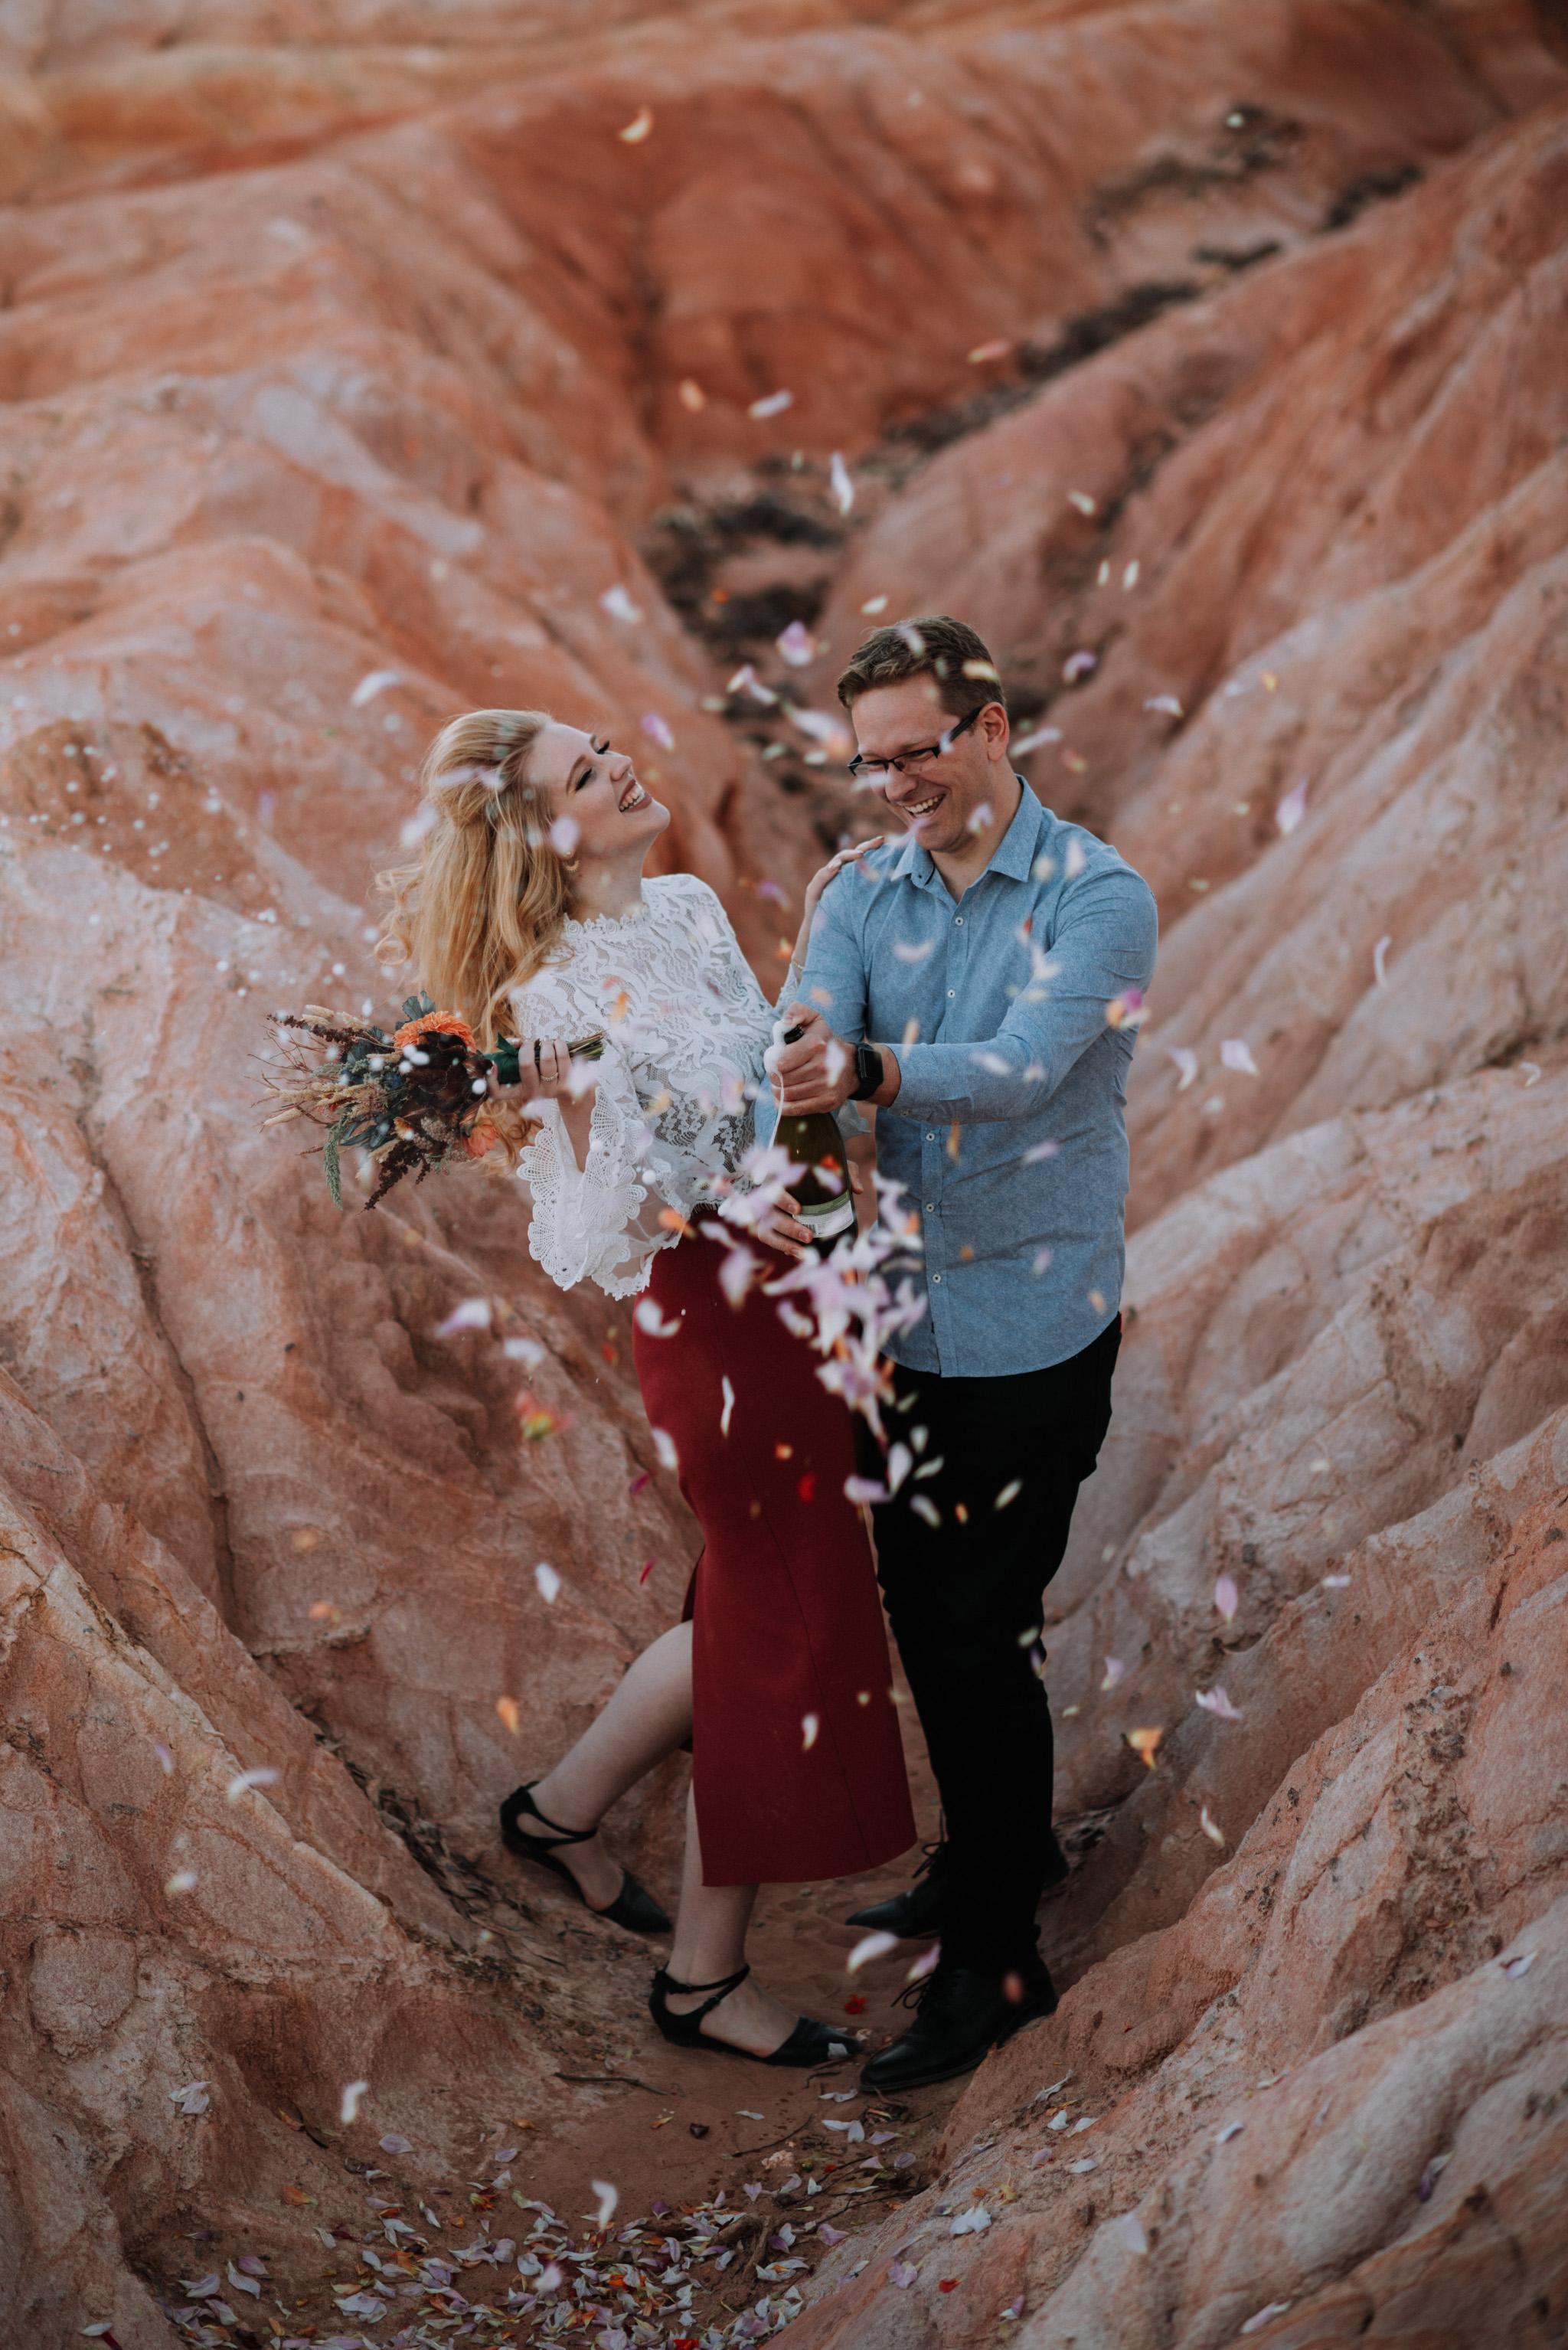 LOVELENSCAPES PHOTOGRAPHY • VISUAL POETRY • MELBOURNE WEDDING PHOTOGRAPHER • ALANNAH HILL DRESS • SUNSET ENGAGEMENT PHOTOS • PINK CLIFFS HEATHCOTE • FASHION EDITORIAL PHOTOGRAPHER • 7.jpg